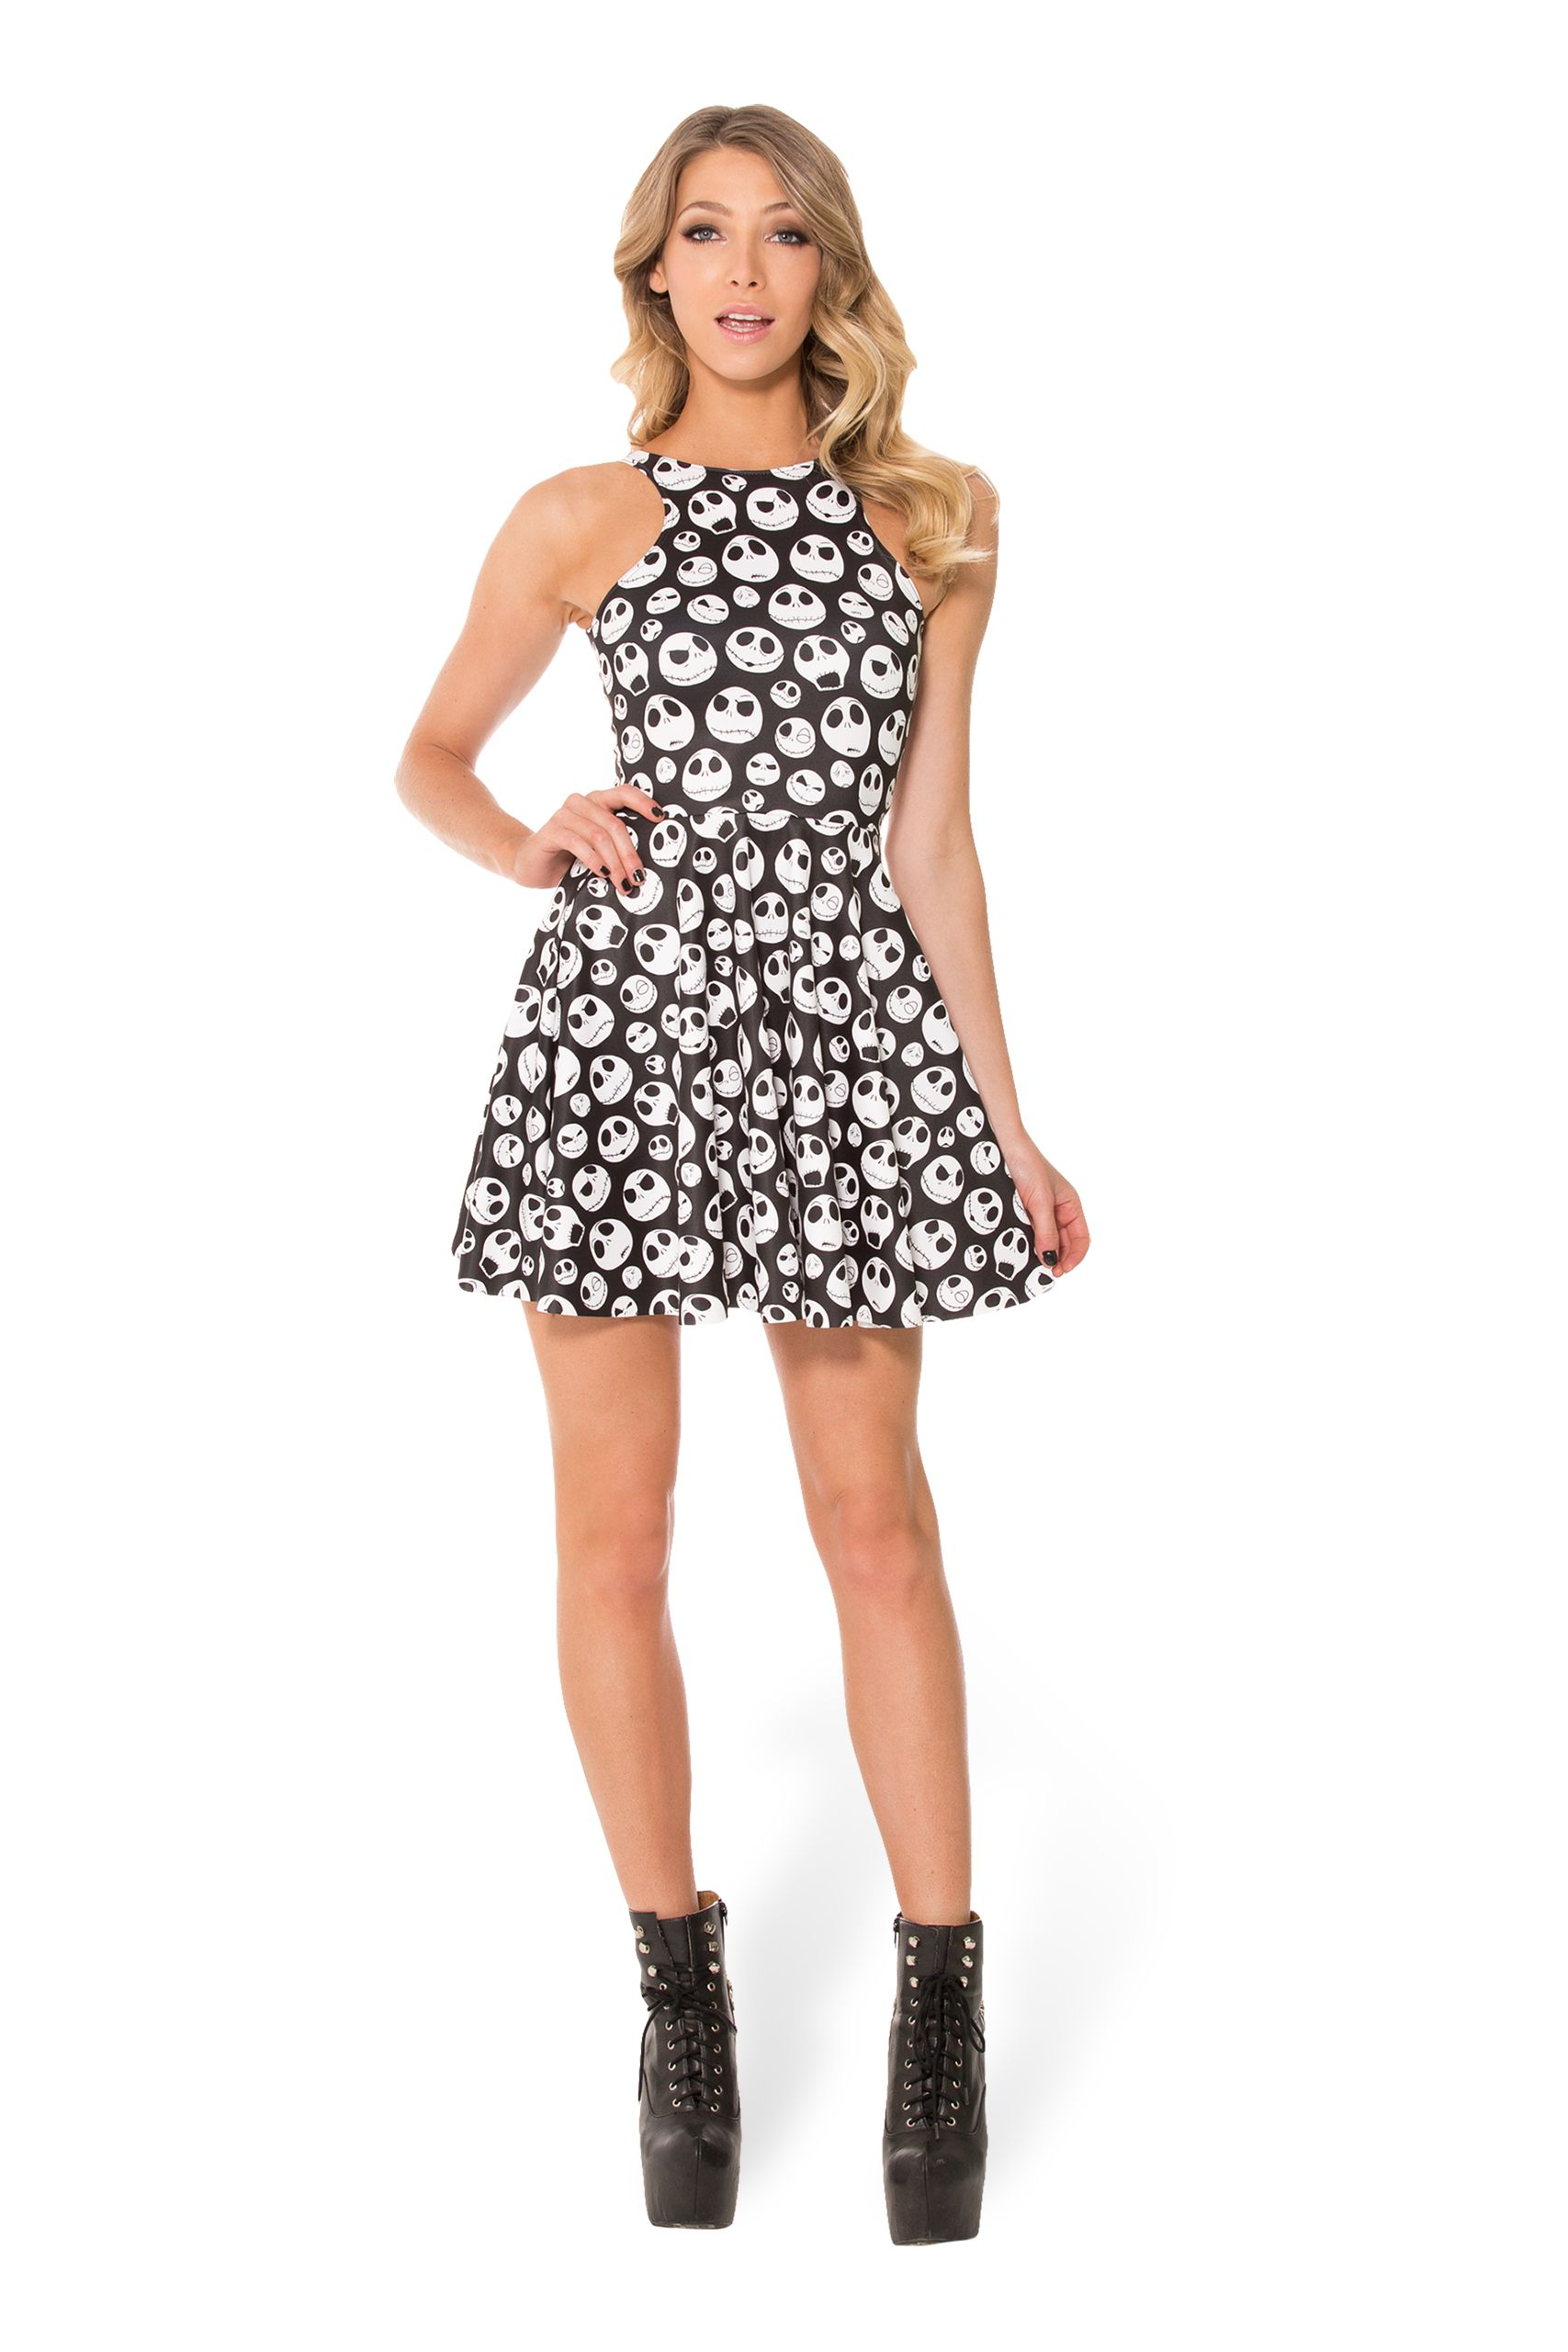 1c9722b1e5 Jack Skellington Reversible Skater Dress (WW $95AUD / US $90USD) by Black  Milk Clothing